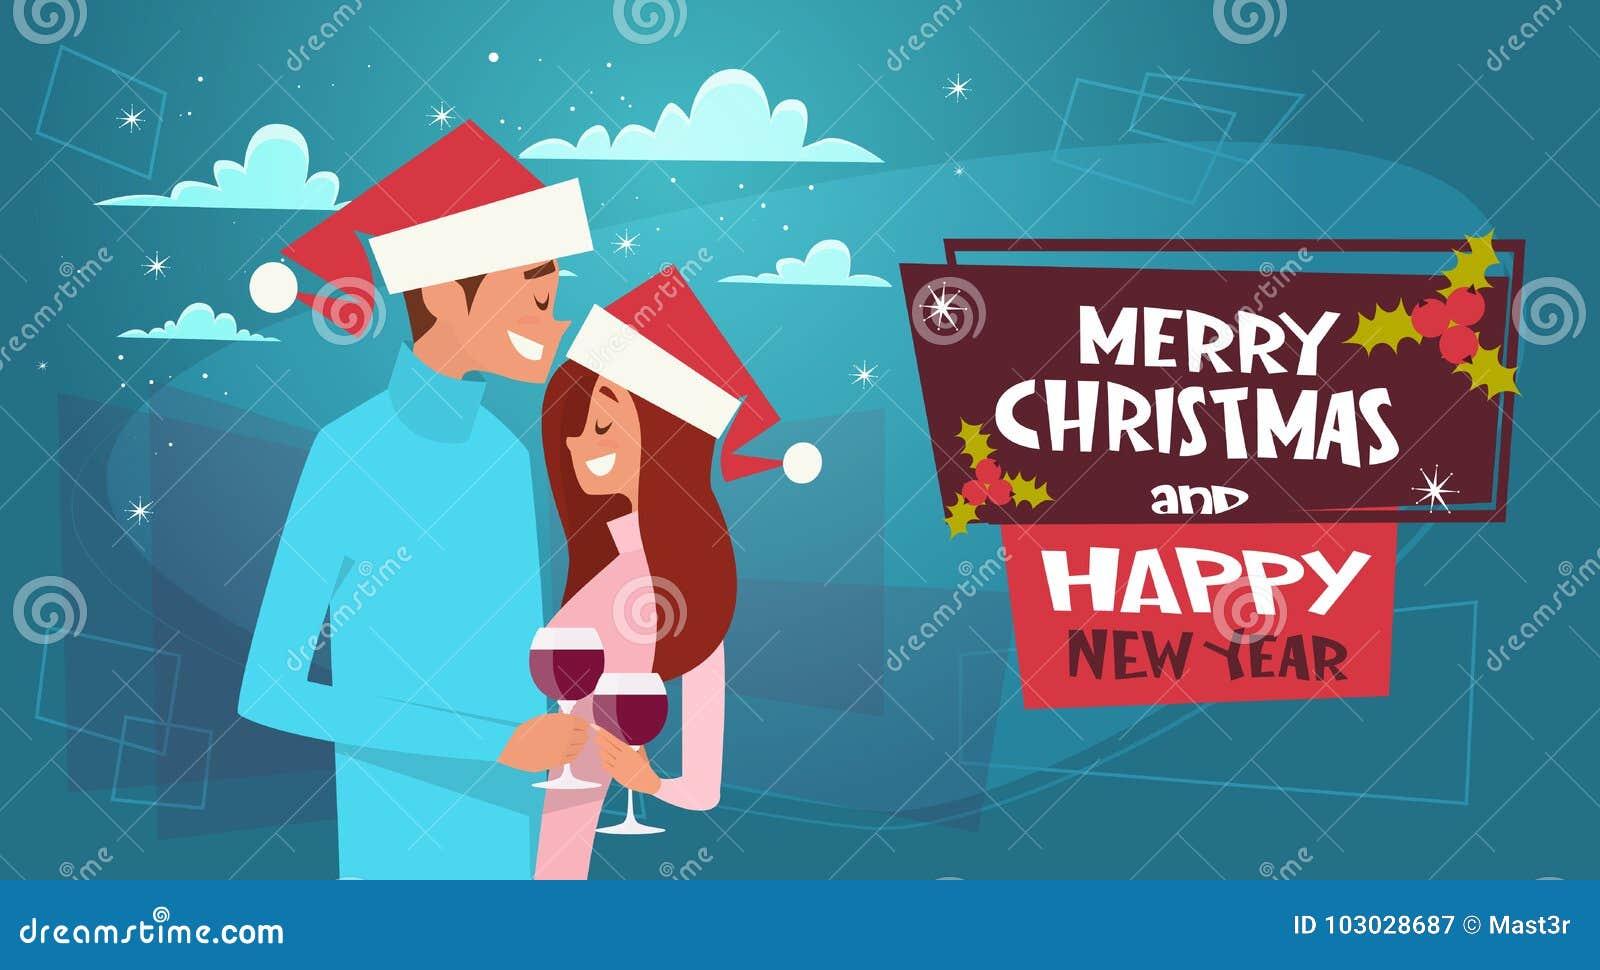 Gelukkig Paar in Santa Hats Embracing On Merry-Kerstmis en Gelukkige Nieuwjaaraffiche